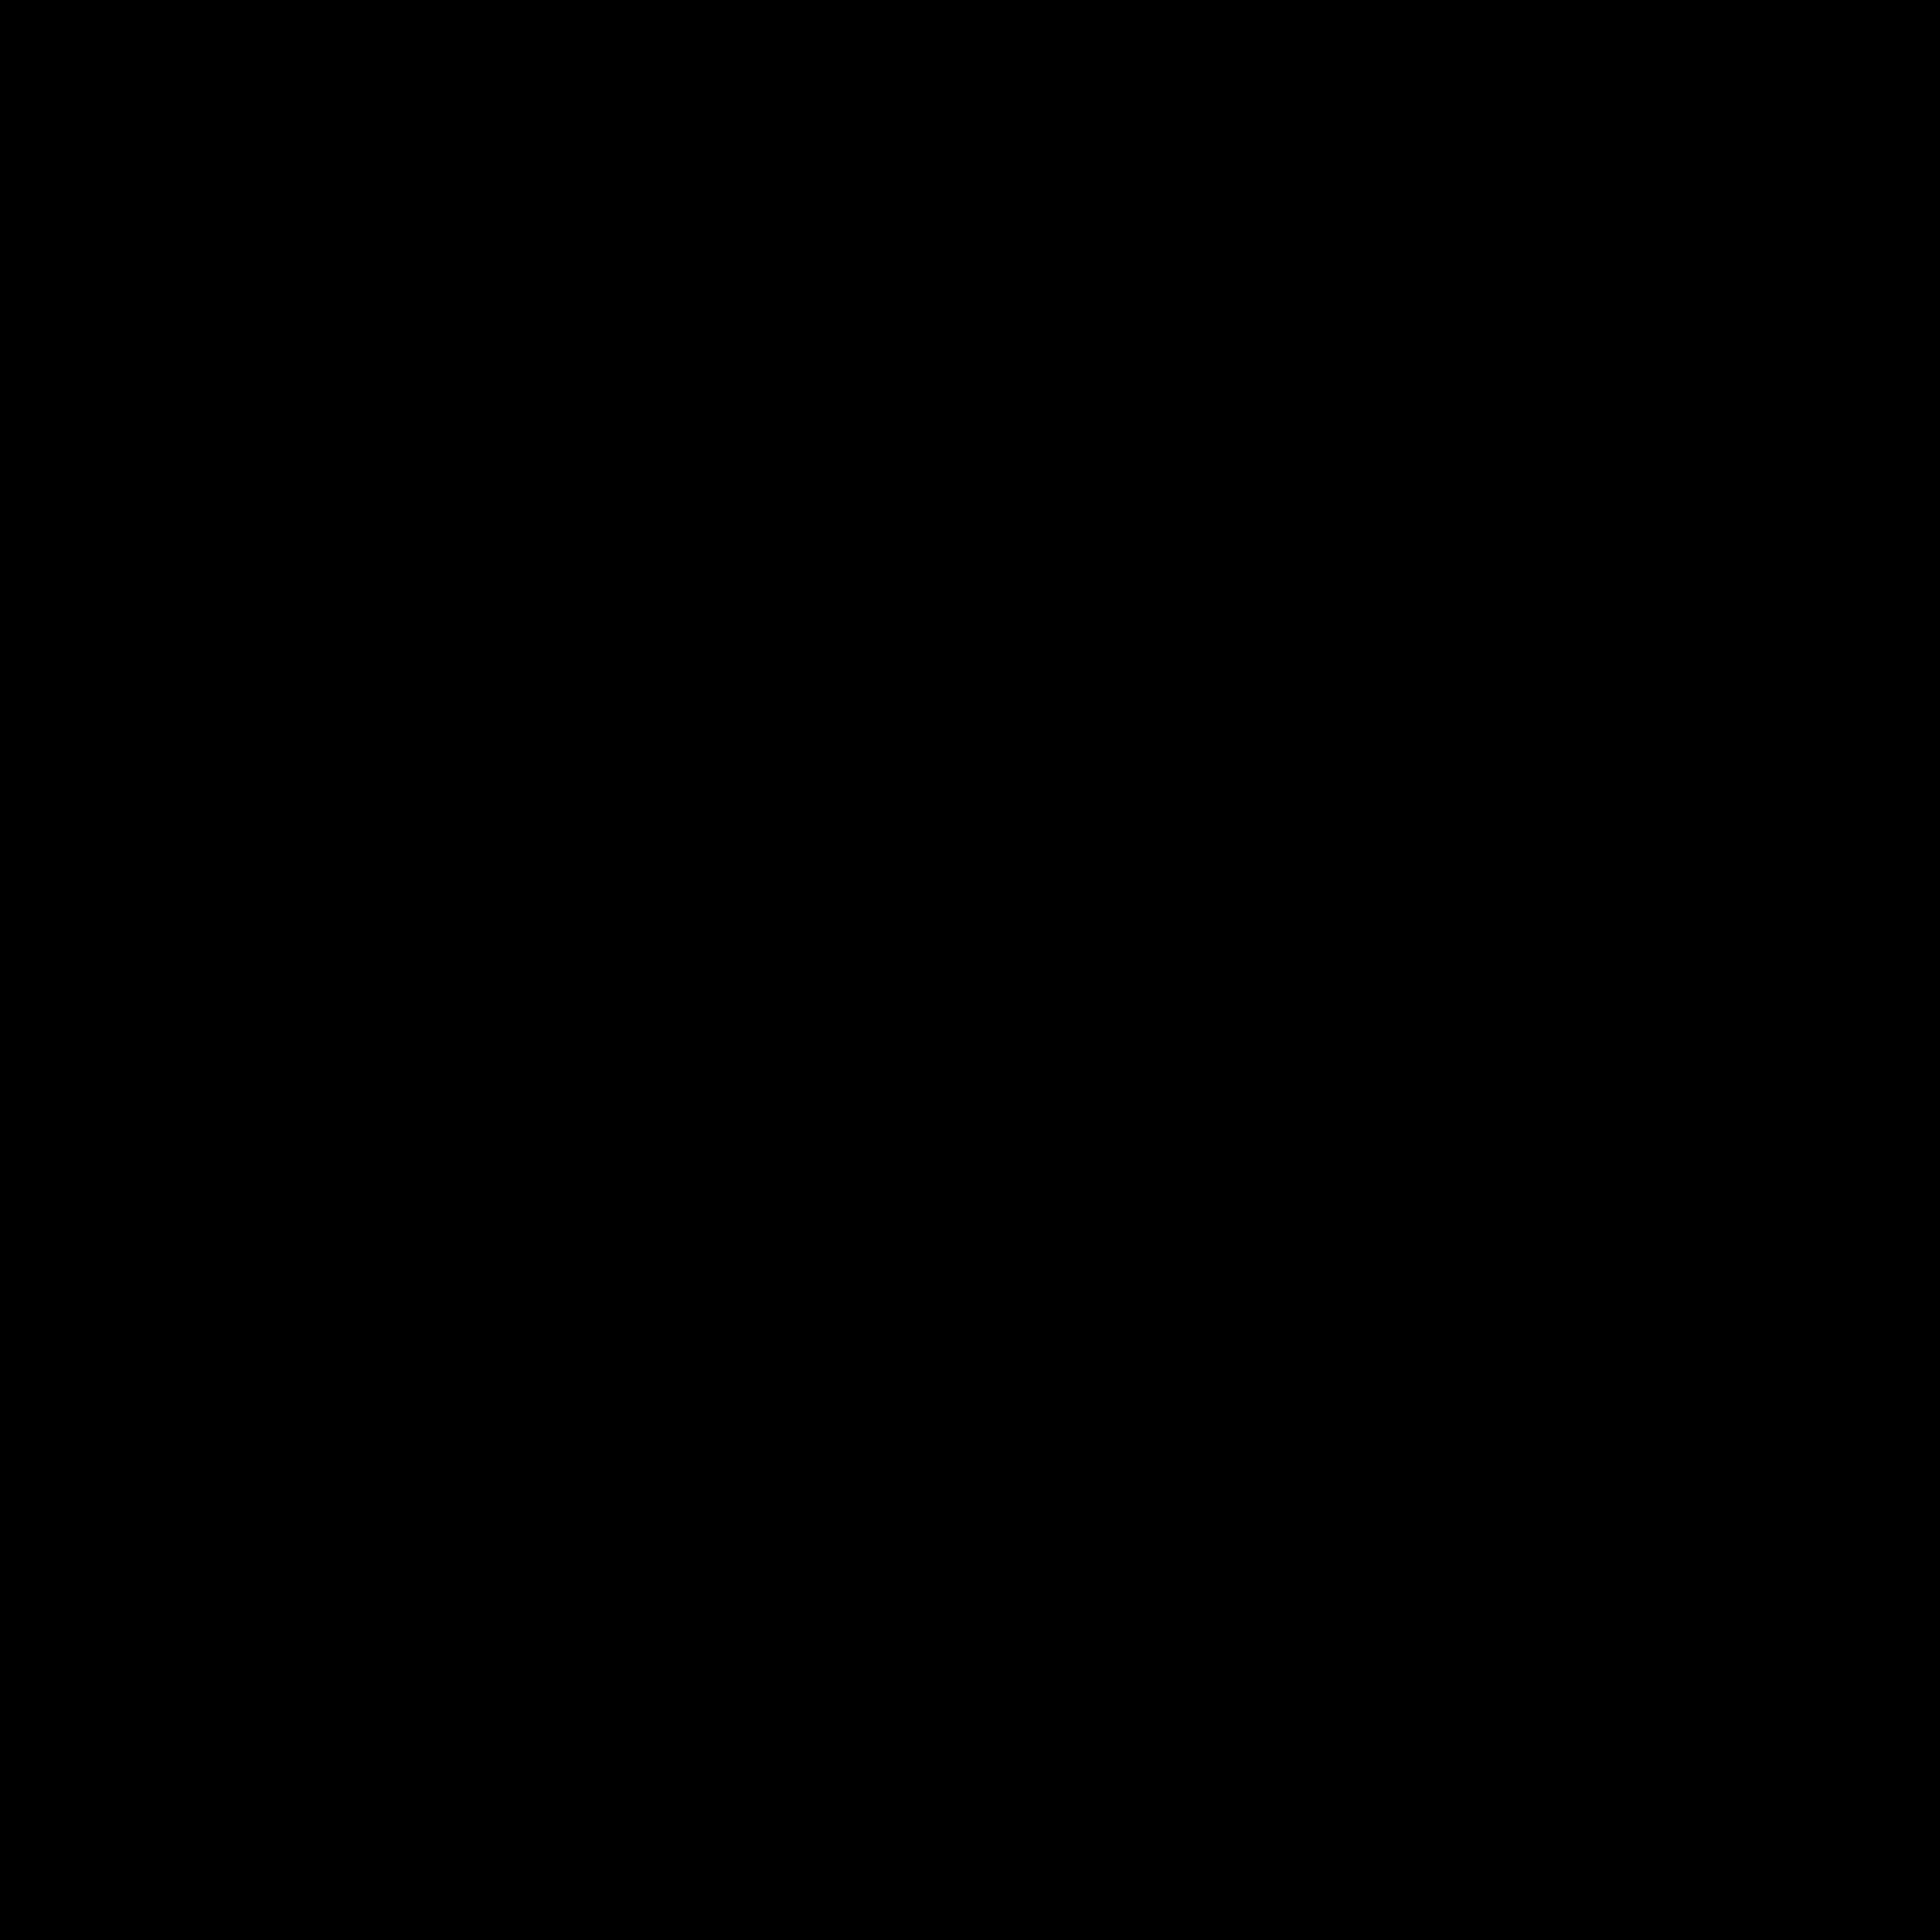 sephora logo 0 - Sephora Logo